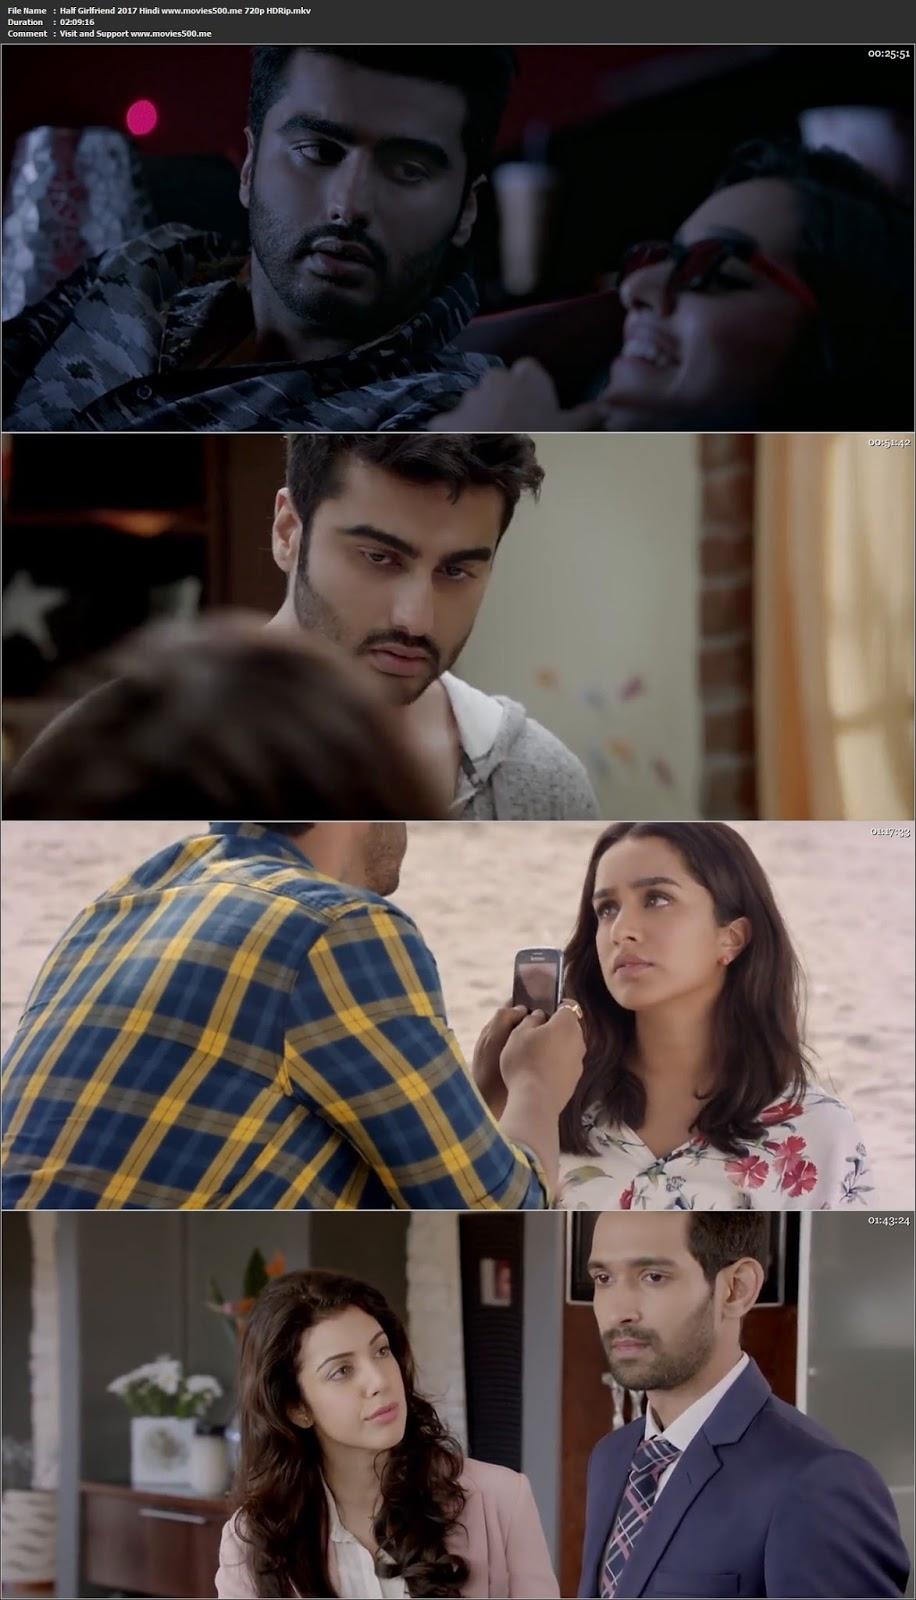 Half Girlfriend 2017 Full Movie Hindi HDRip 720p at freedomcopy.com